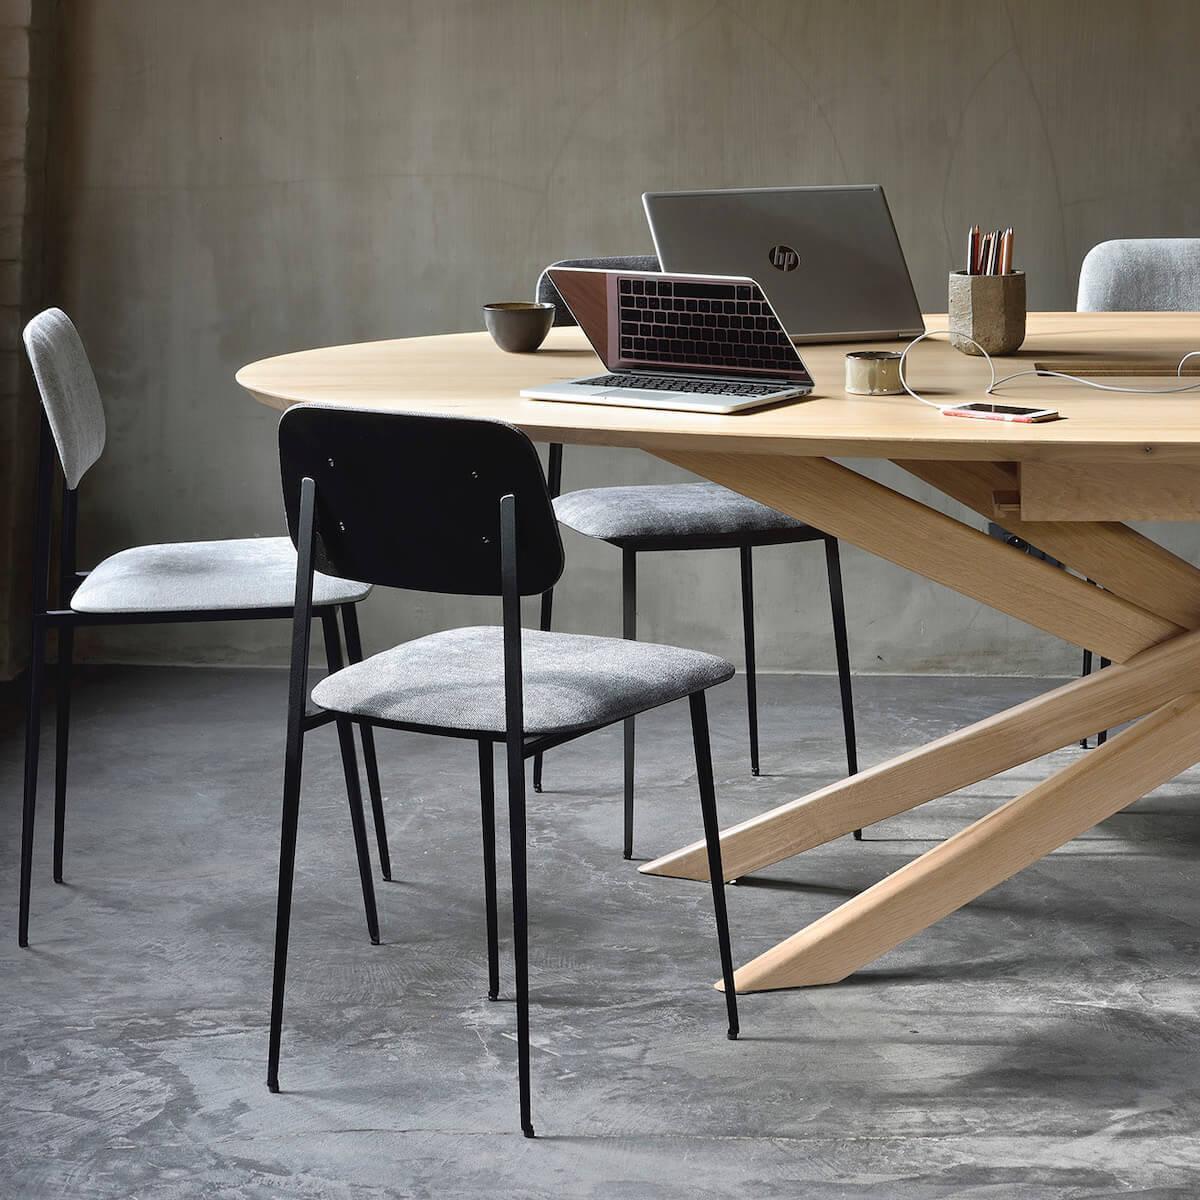 Table réunion 138x267cm MIKADO Ethnicraft chêne